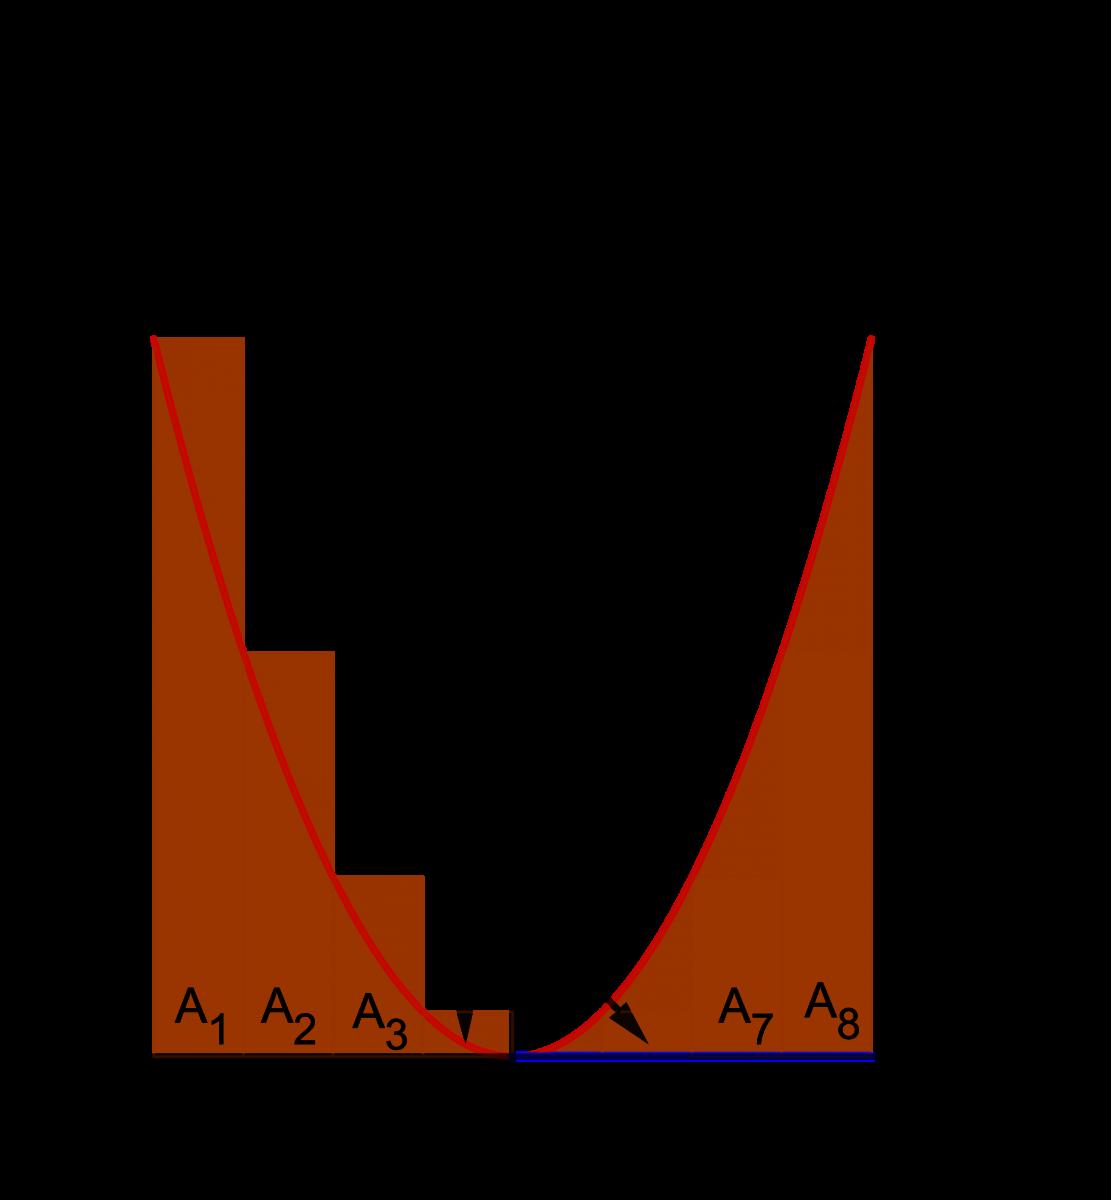 Jumlah Riemann - Titik Ujung Kiri (8 subselang)